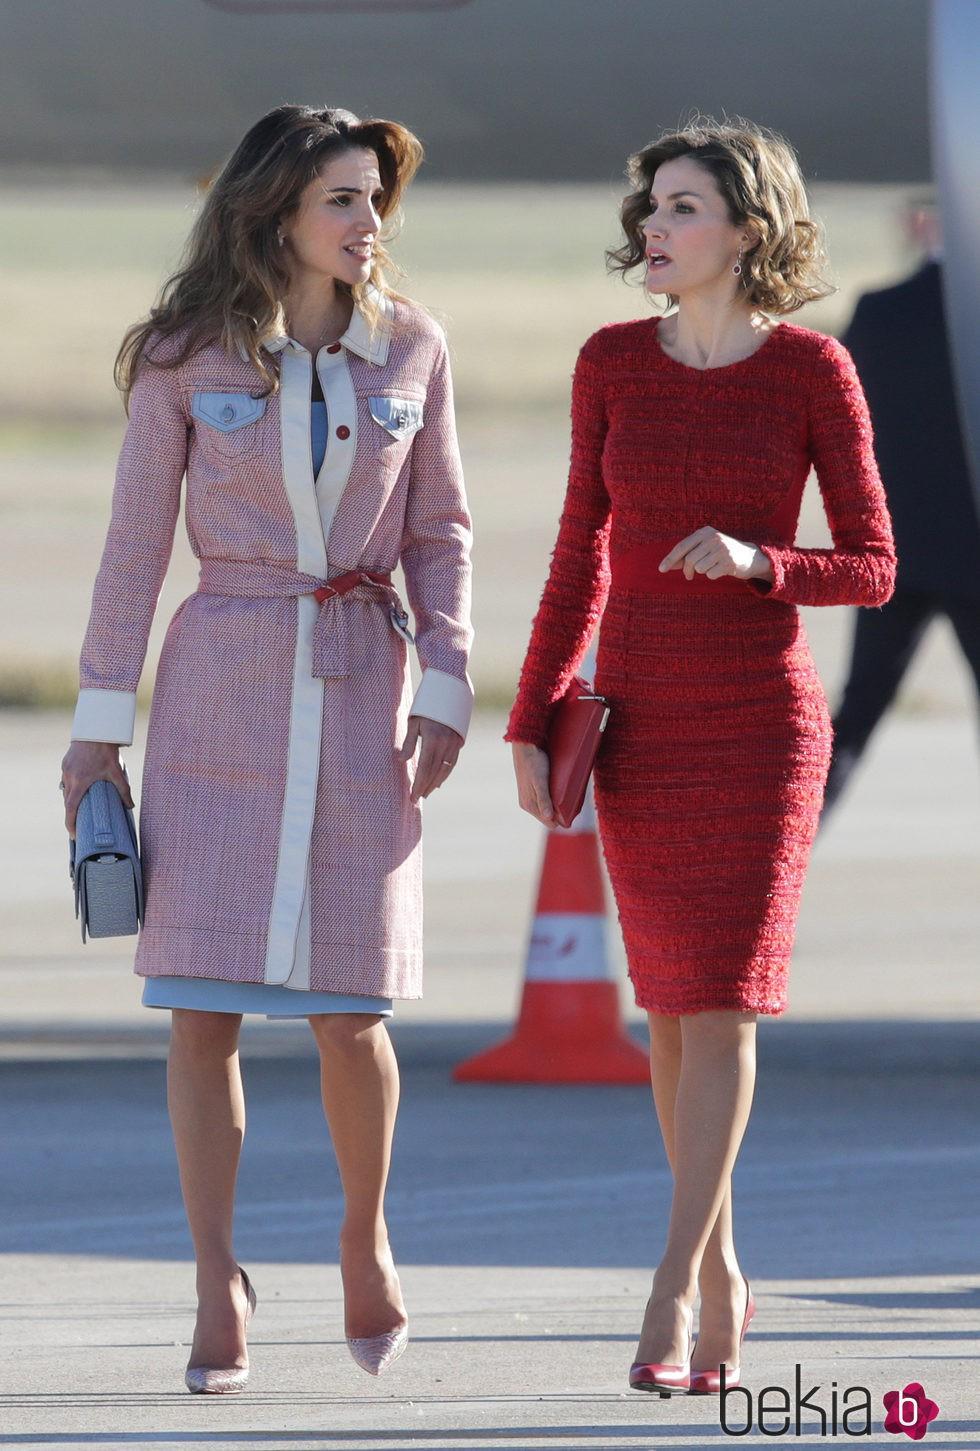 Rania de Jordania y la Reina Letizia charlan en aeropuerto de Madrid